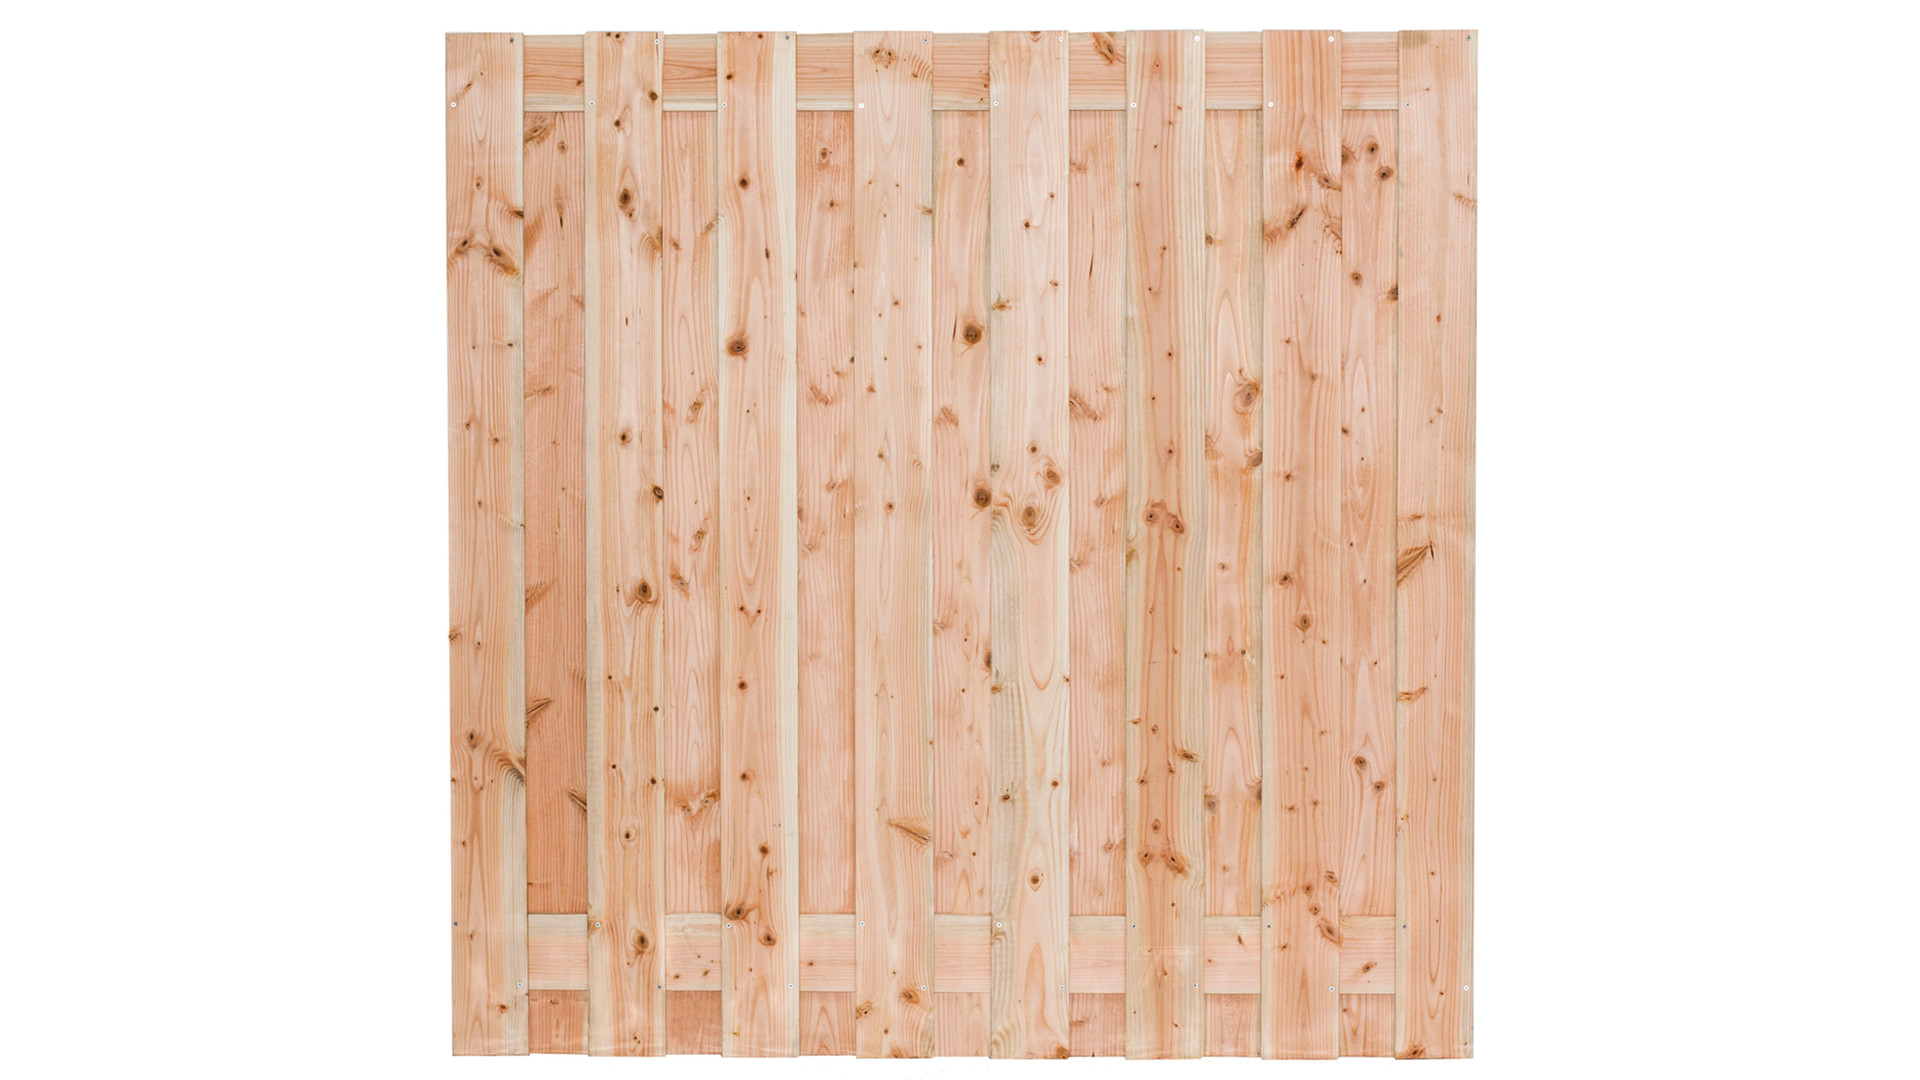 Tuinscherm Zwarte Woud lariks/douglas 19-planks